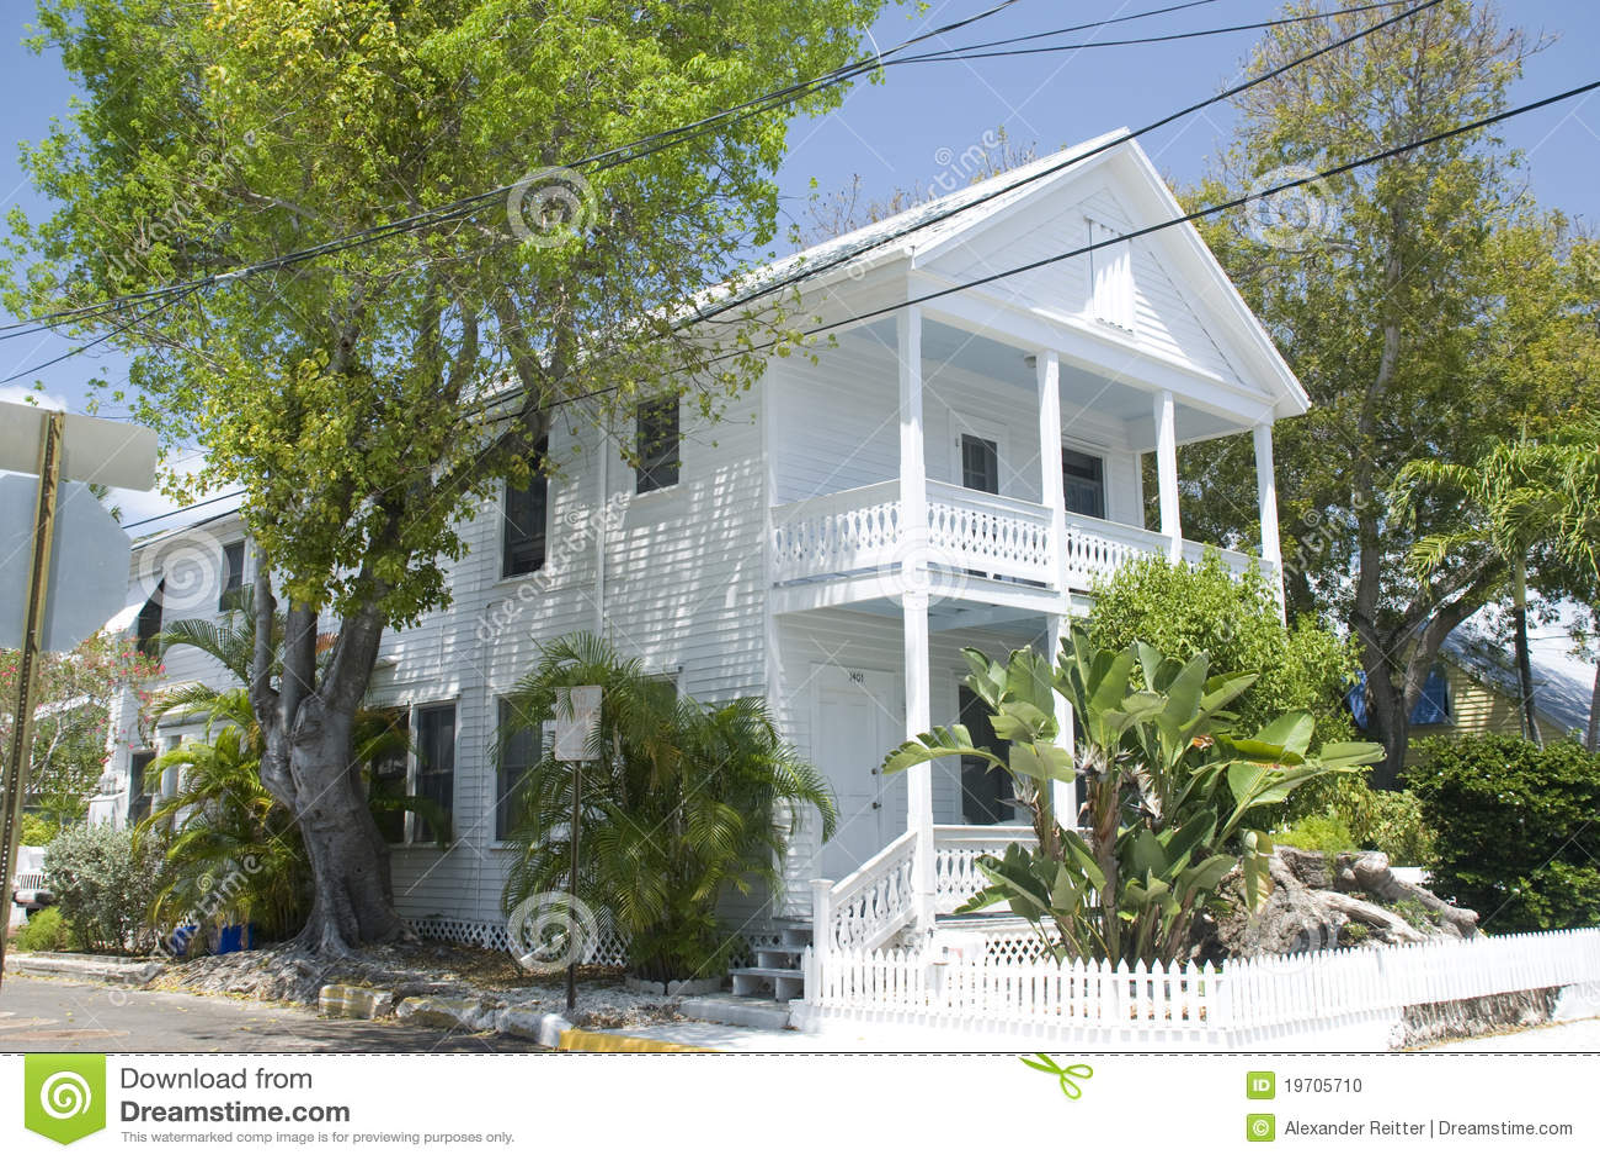 Key West House Stock Photo  Image: 19705710 - House Plans For Florida